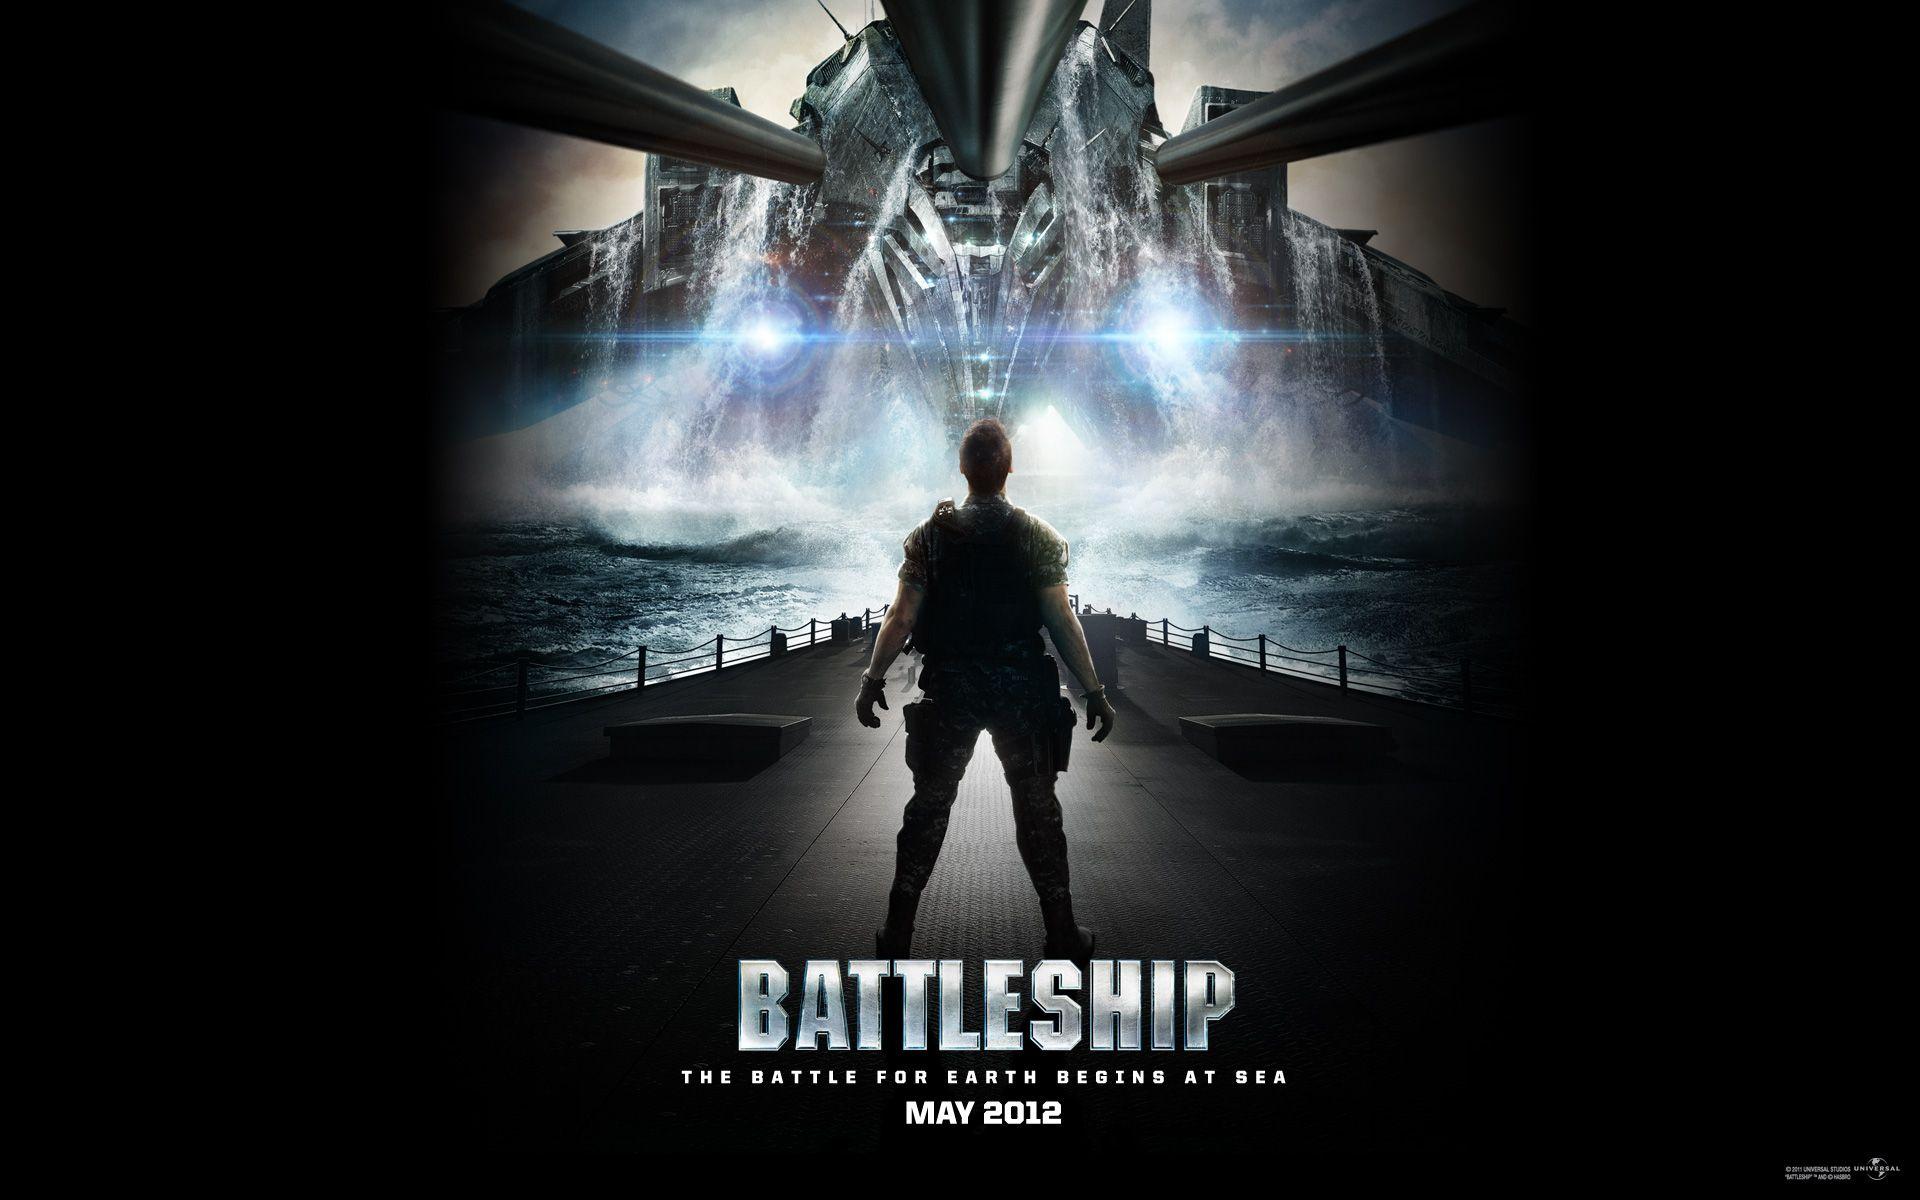 Battleship 2012 Movie Wallpaper Battleship Wallpapers Battleship Movie Wallpapers Fleet Of Ships